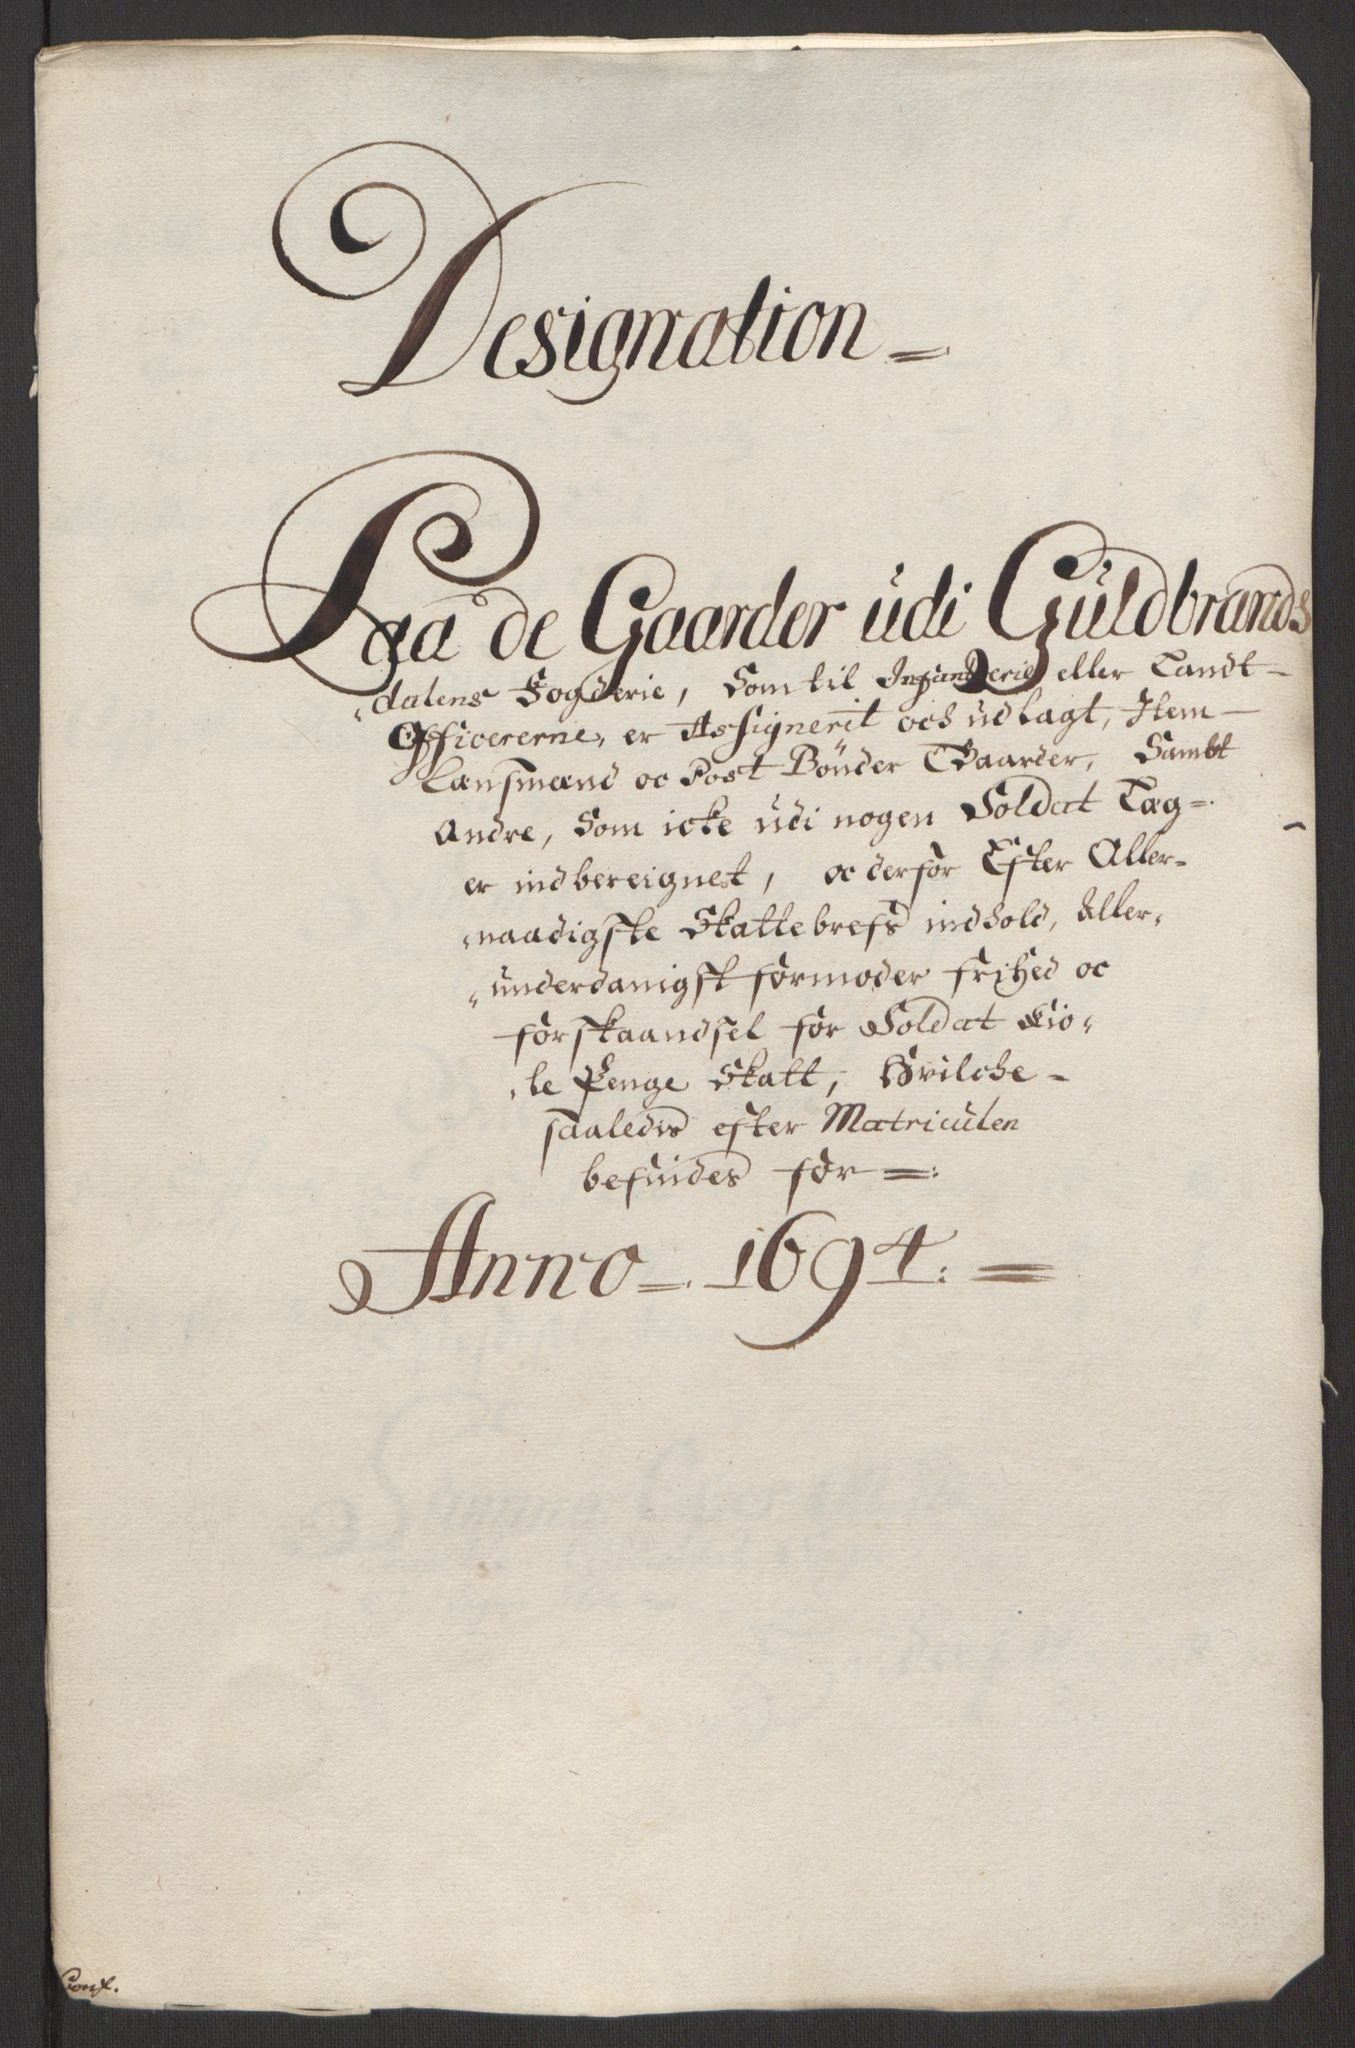 RA, Rentekammeret inntil 1814, Reviderte regnskaper, Fogderegnskap, R17/L1168: Fogderegnskap Gudbrandsdal, 1694, s. 334